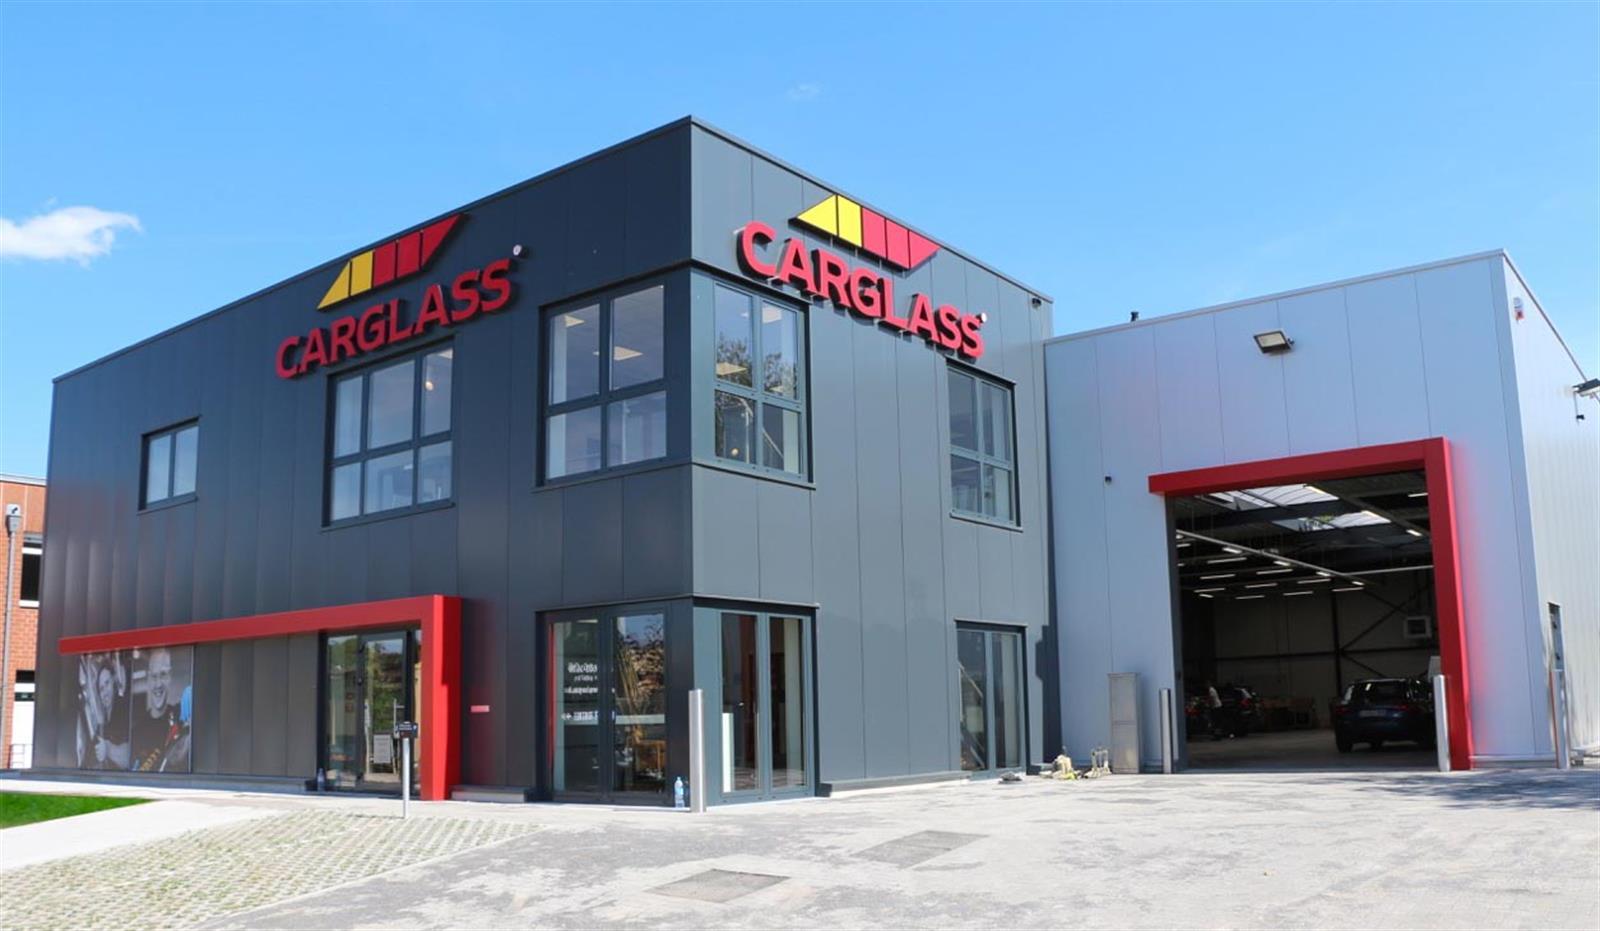 carglass luxembourg r paration impact accessoire quipement et fourniture editus. Black Bedroom Furniture Sets. Home Design Ideas